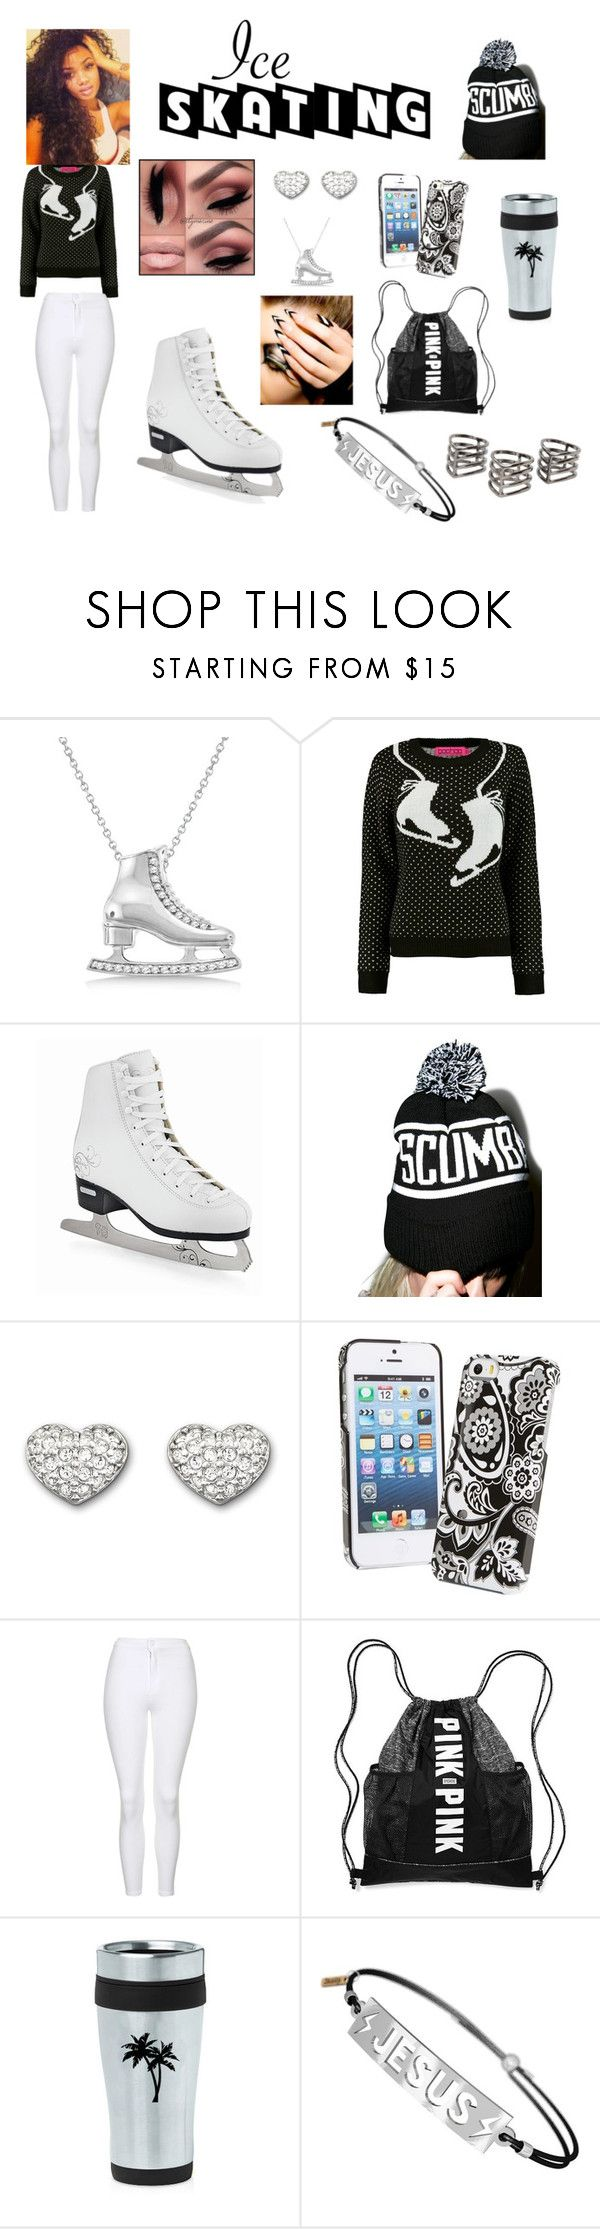 """Ice Skating :)"" by misssloweryyy ❤ liked on Polyvore featuring Allurez, Sourpuss, Swarovski, Lime Crime, Vera Bradley, Topshop, MANGO, women's clothing, women's fashion and women"